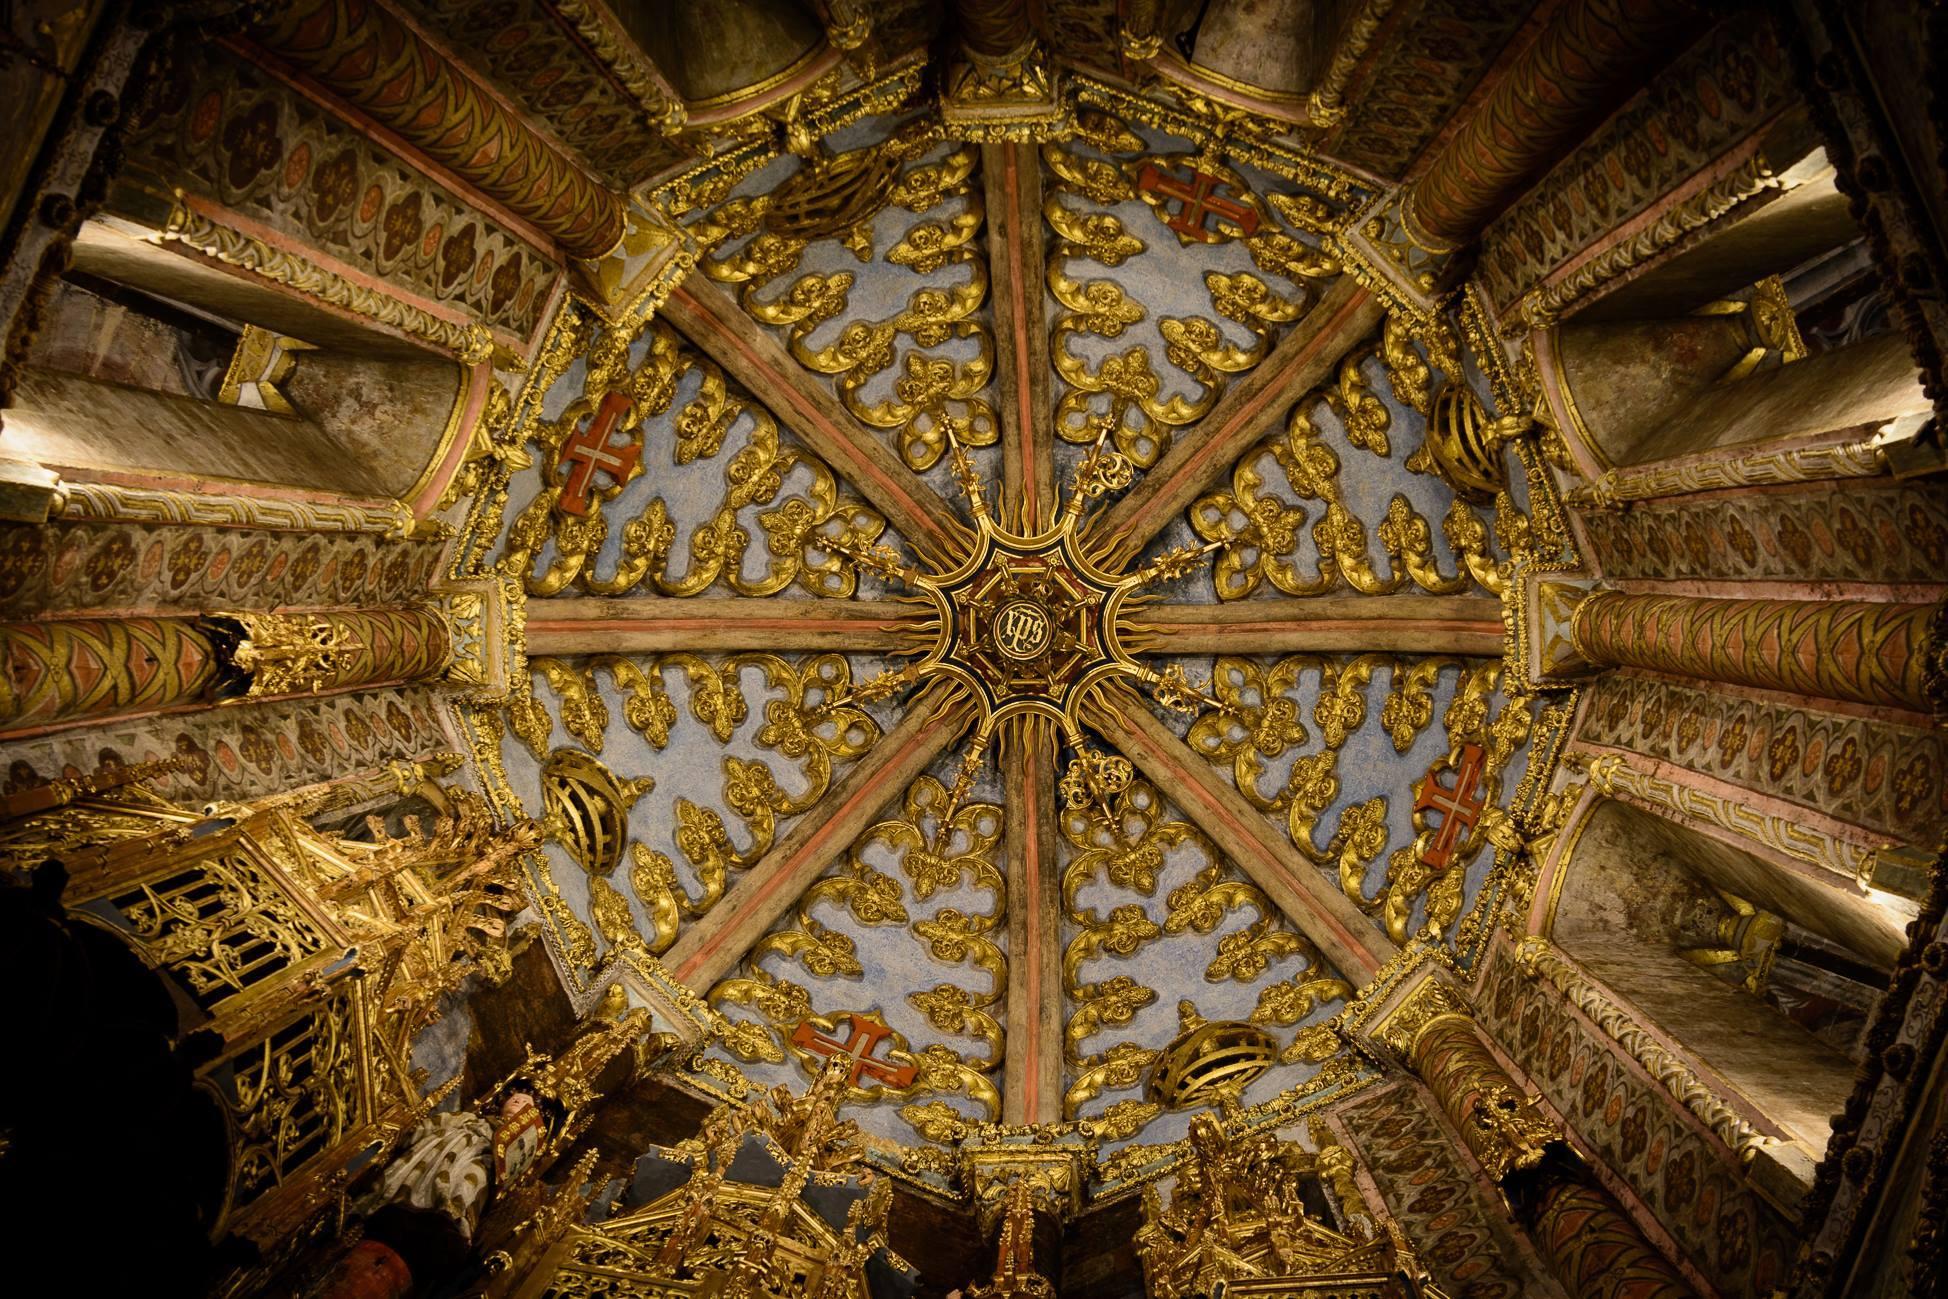 Charola, The Knights Templar chapel